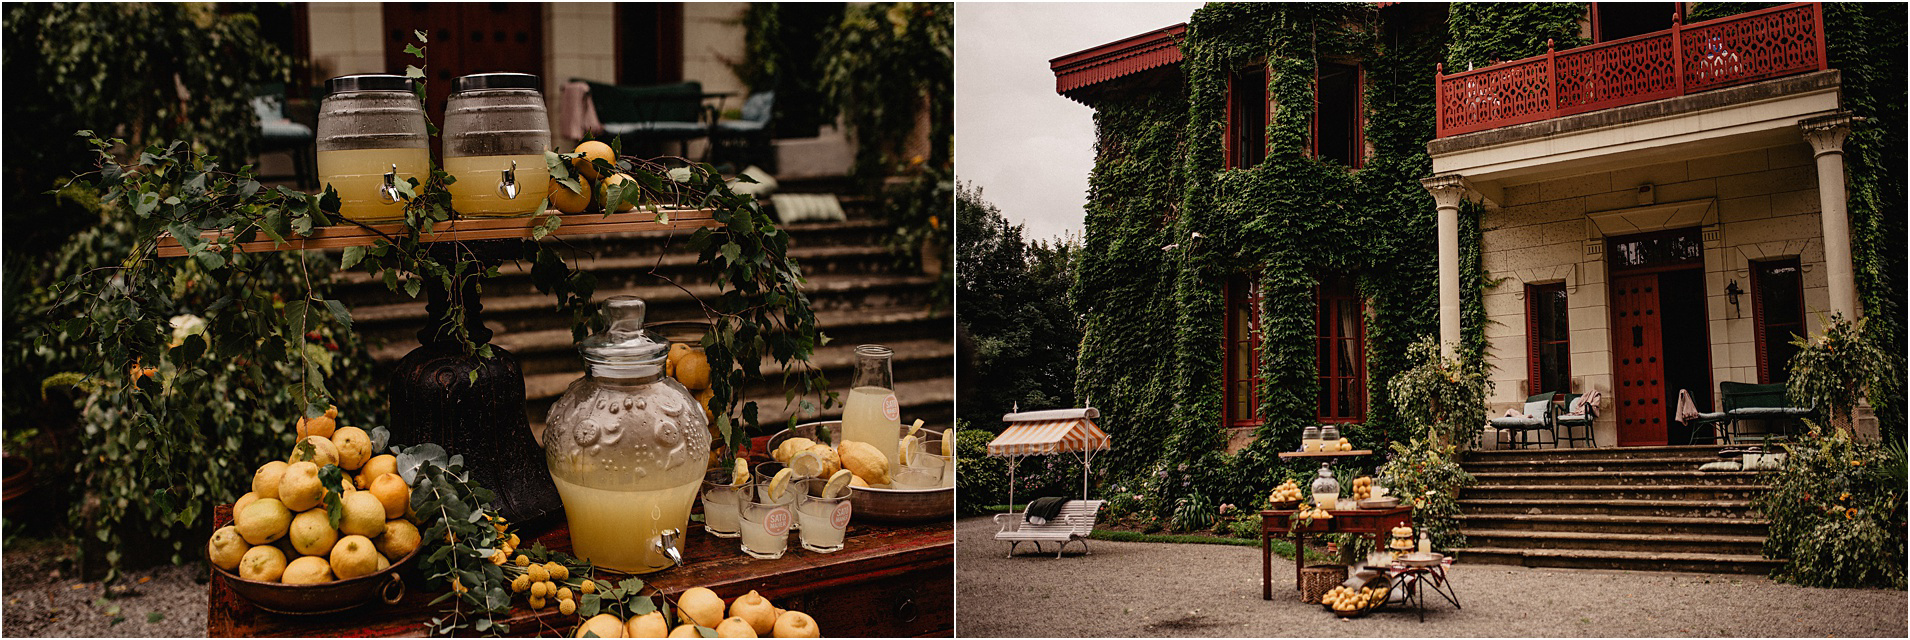 Fotografía y video en Palacio de Arbaisenea Bodas San Sebastián Donostia Guipuzcoa - Finca Arbaisenea by Maher Catering Wedding films and photography-3.jpg